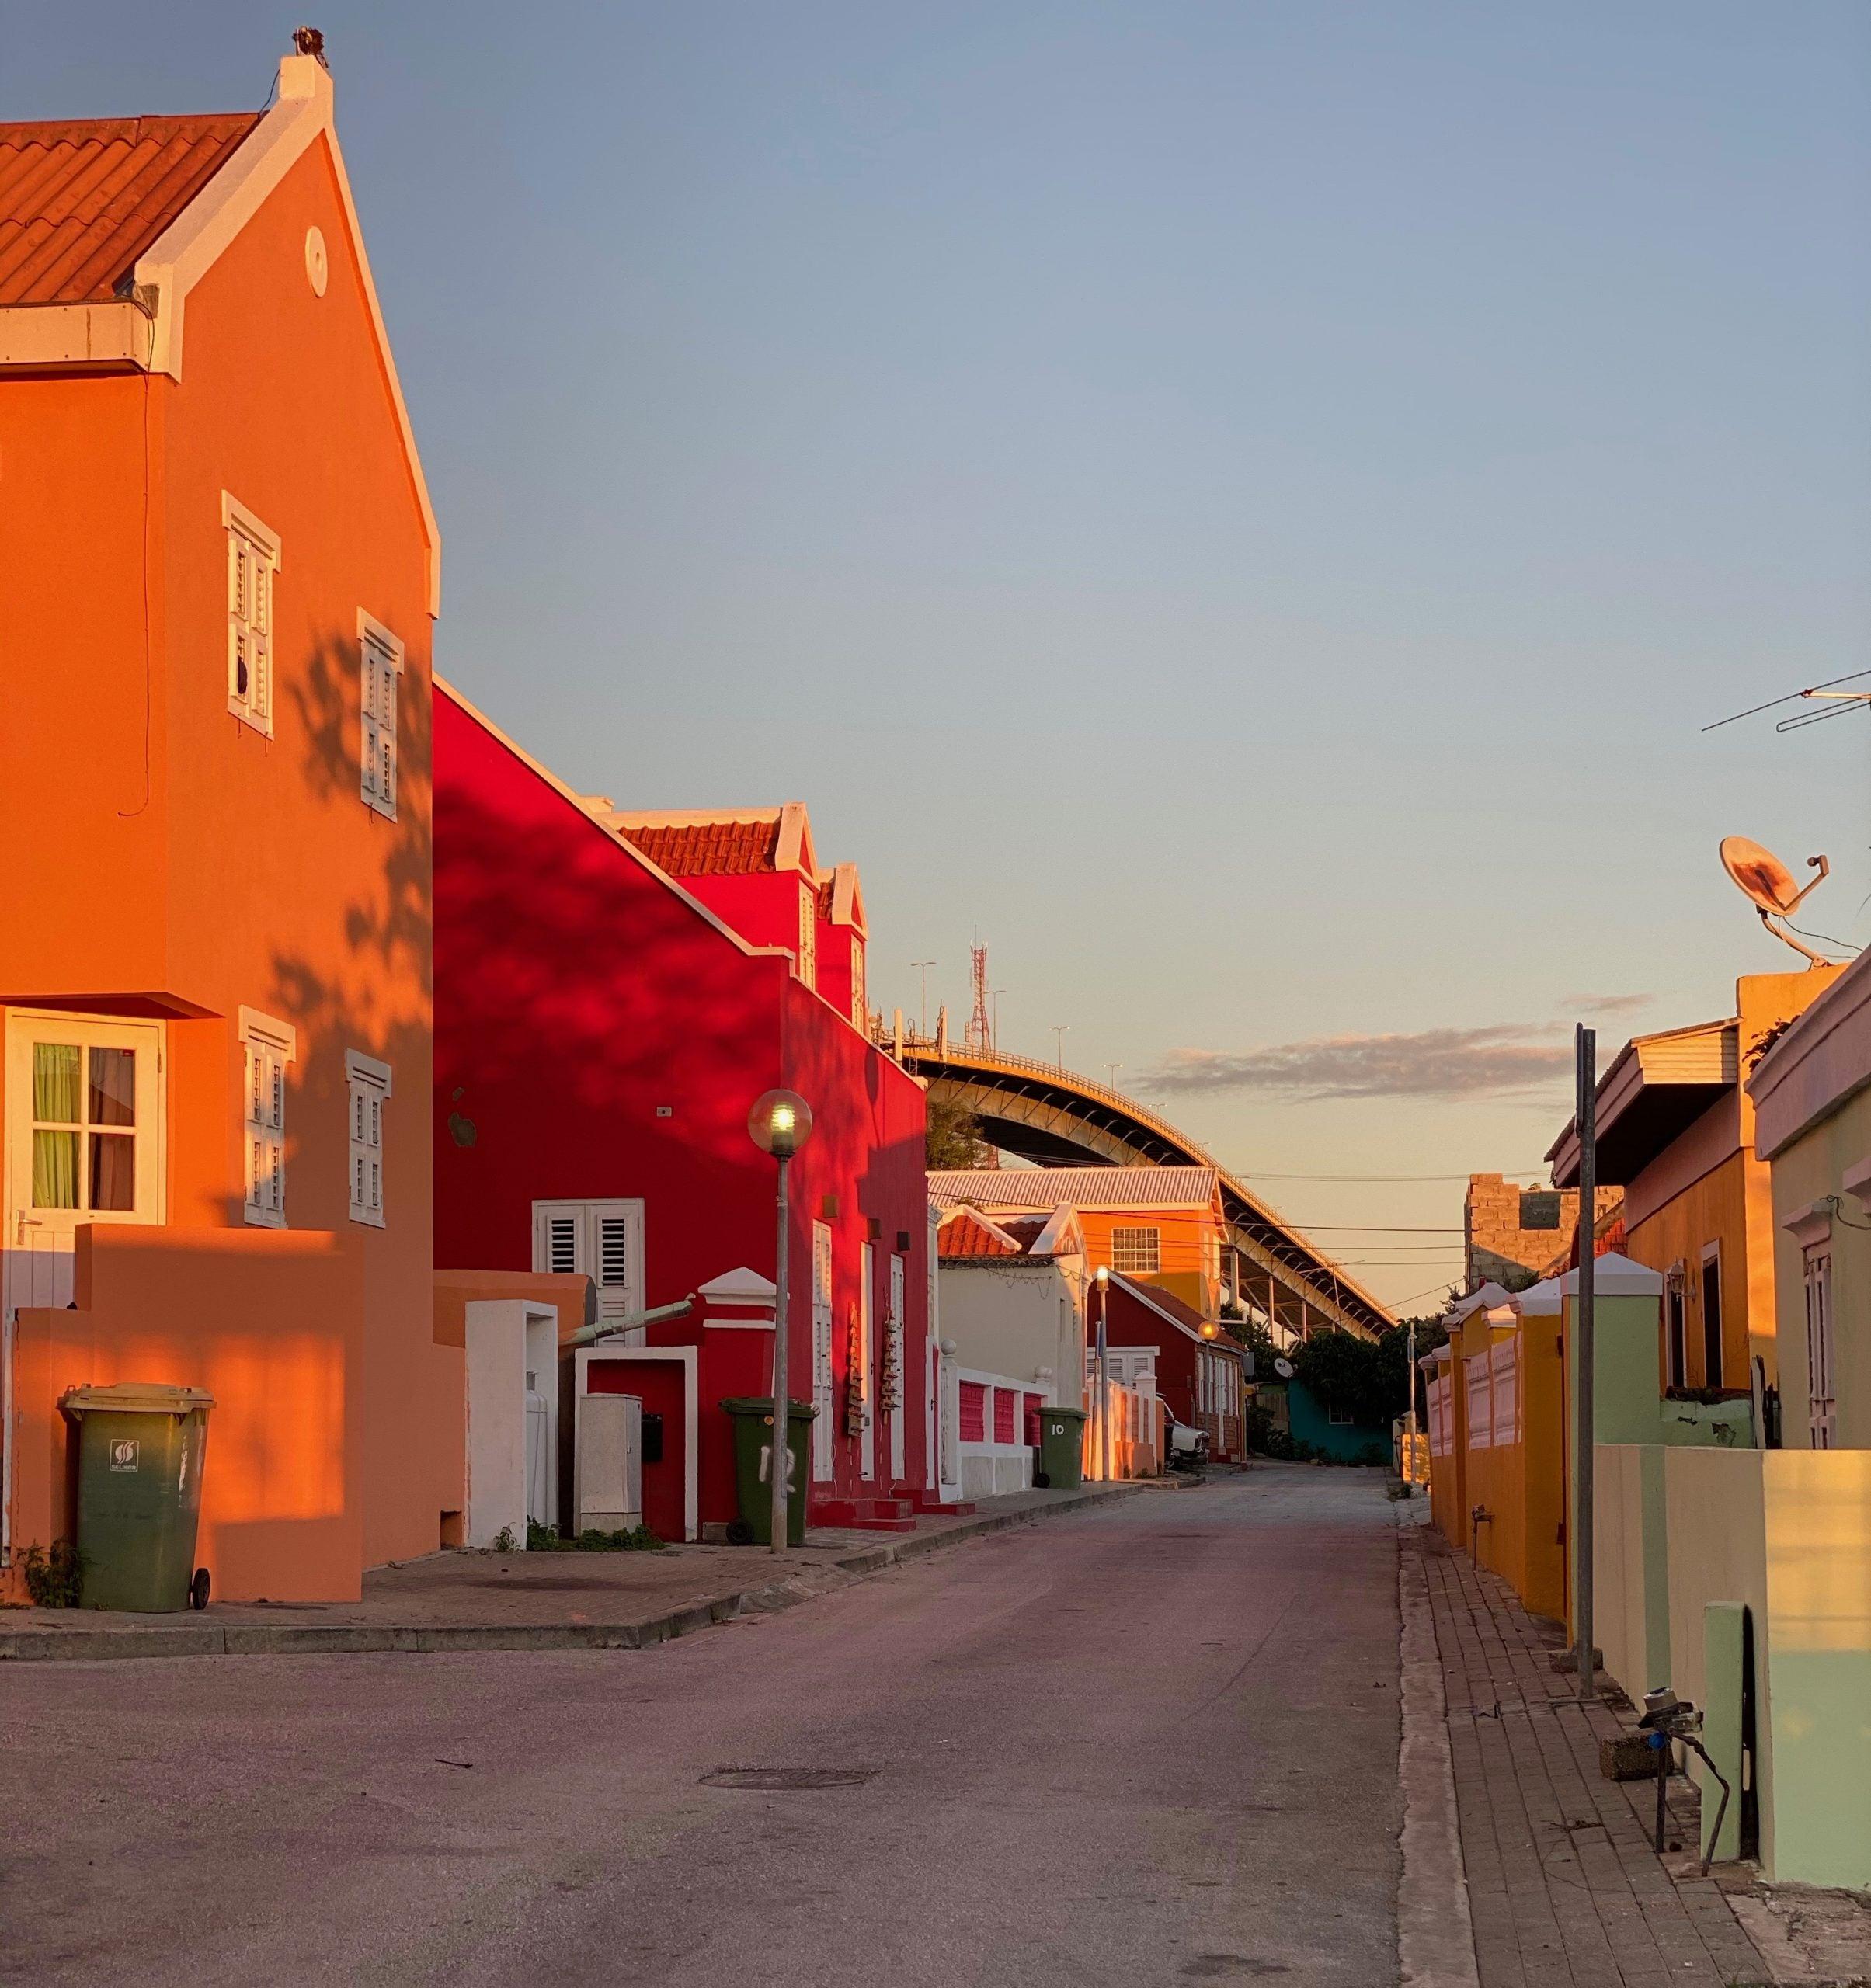 Street in Curacao